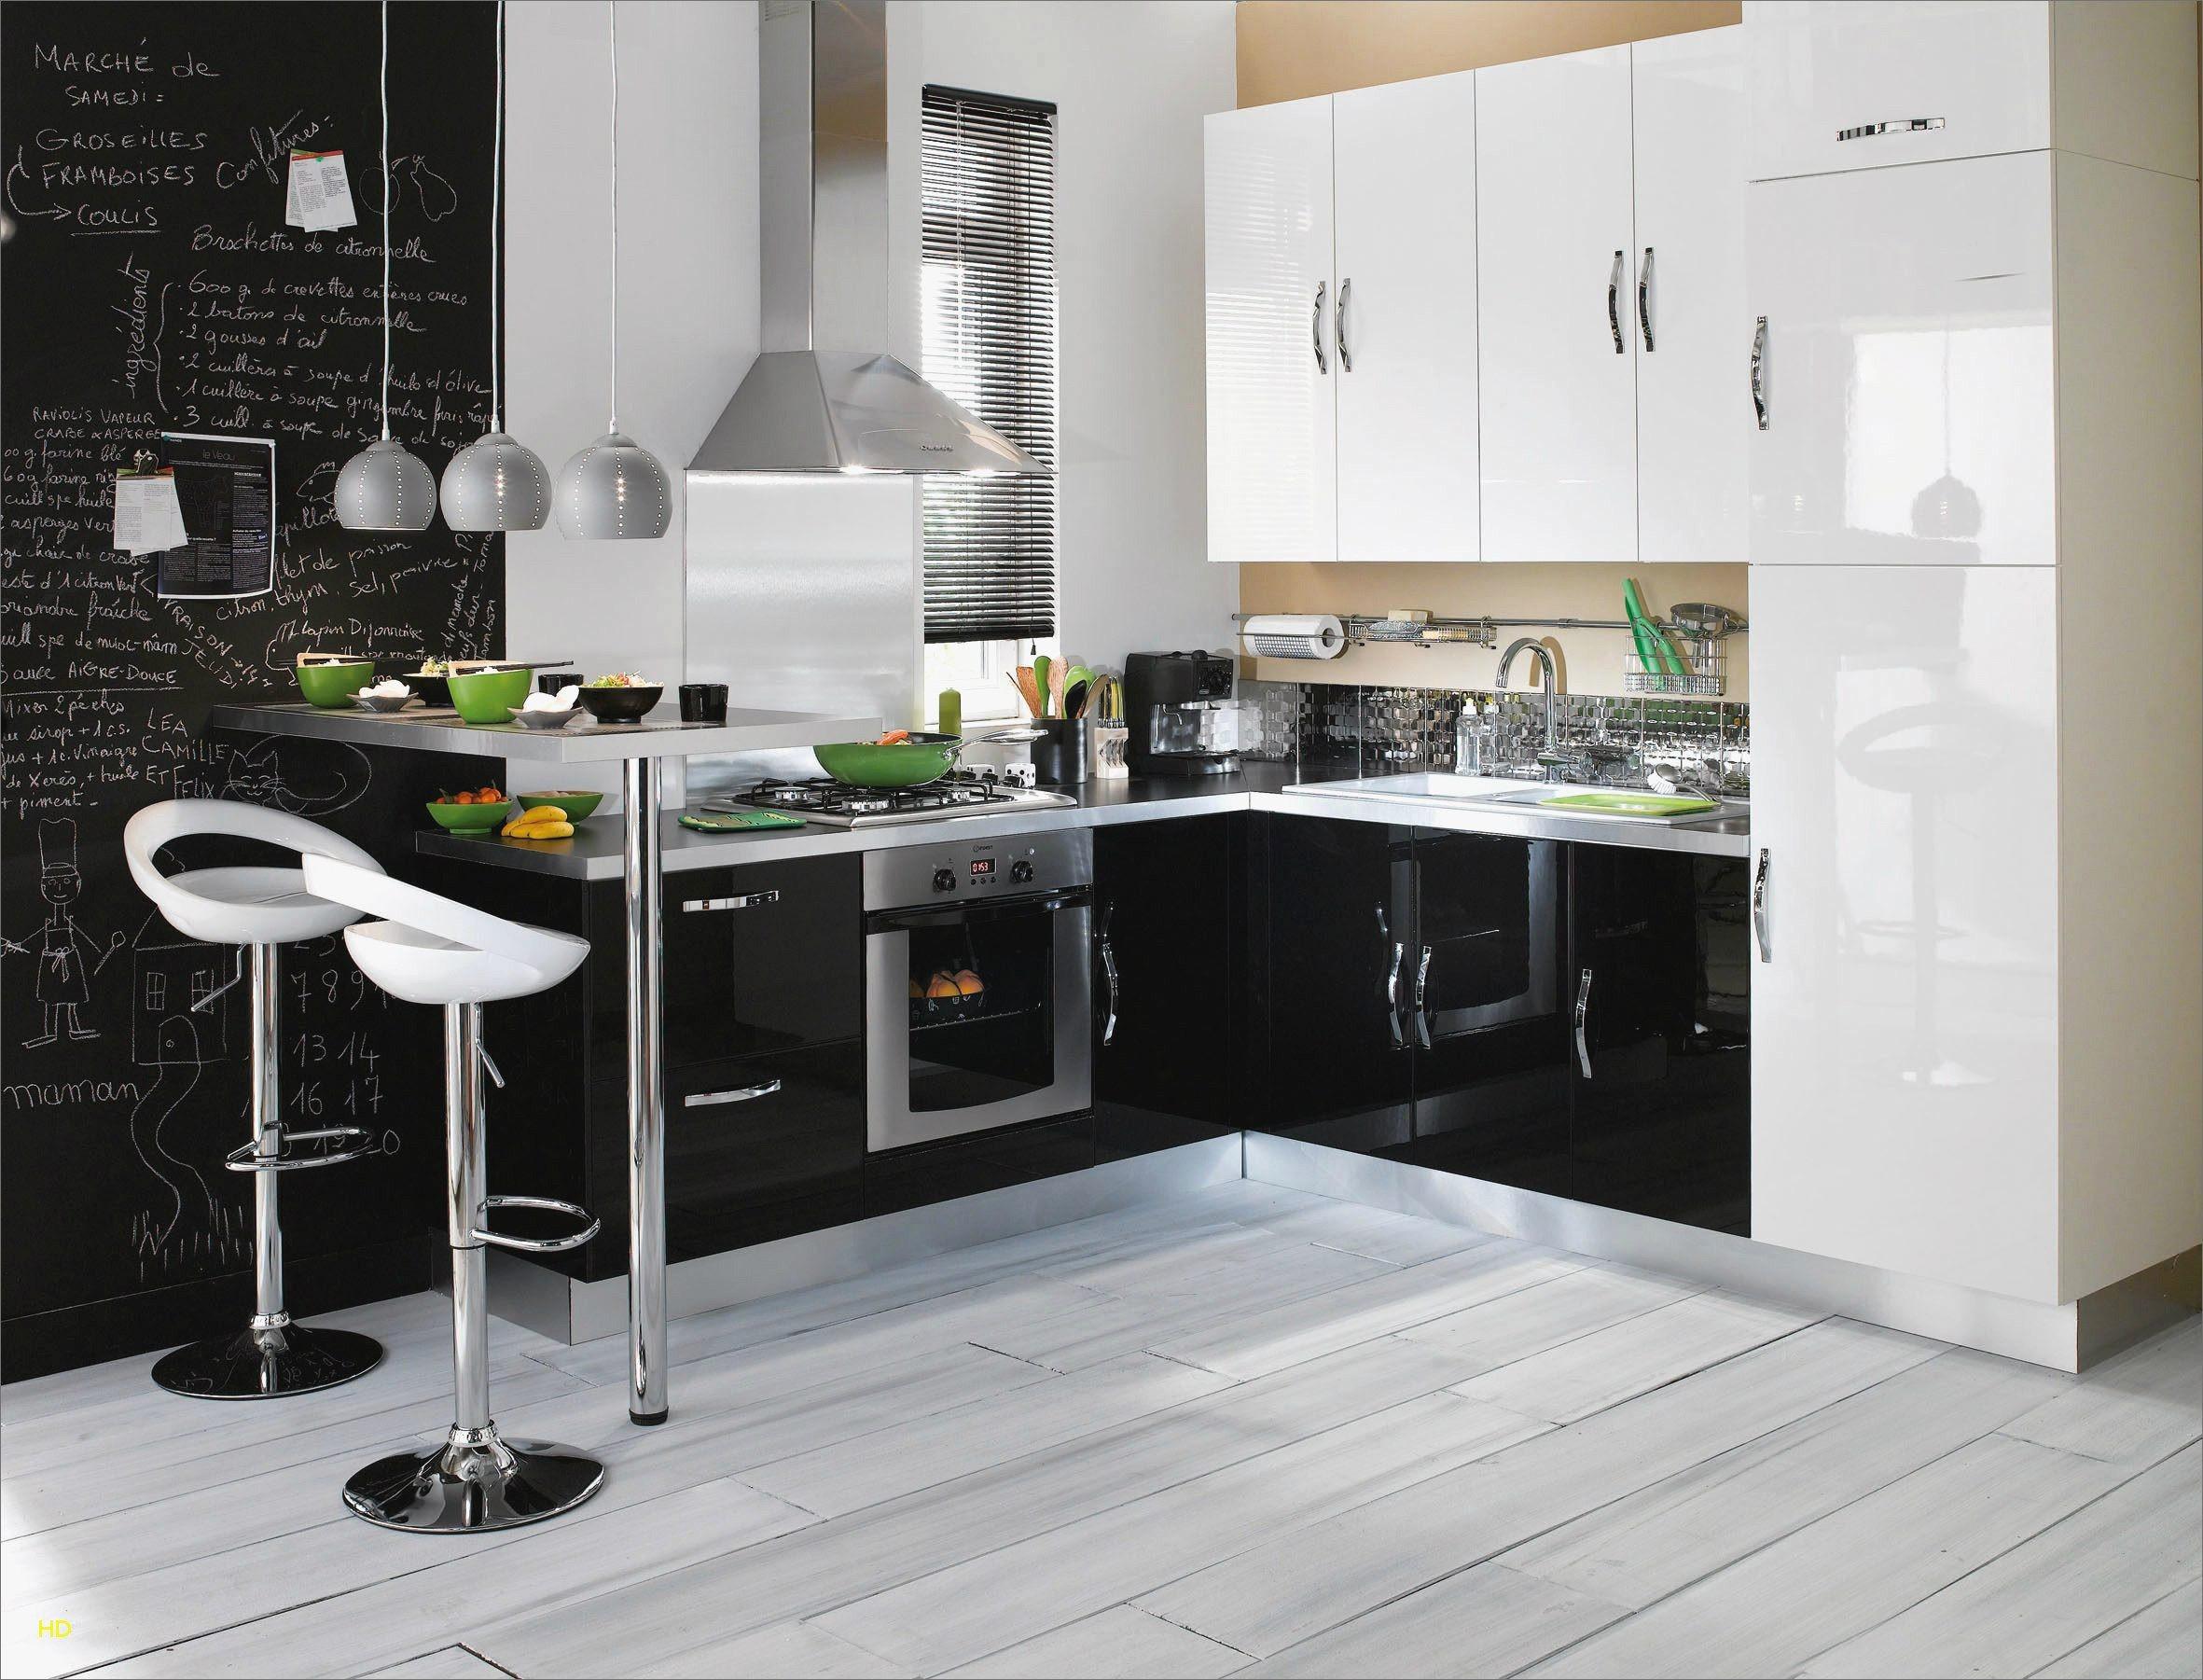 meuble d angle haut cuisine meuble de cuisine angle element bas cuisine chauffeuse d 26 3bangle of meuble d angle haut cuisine 1